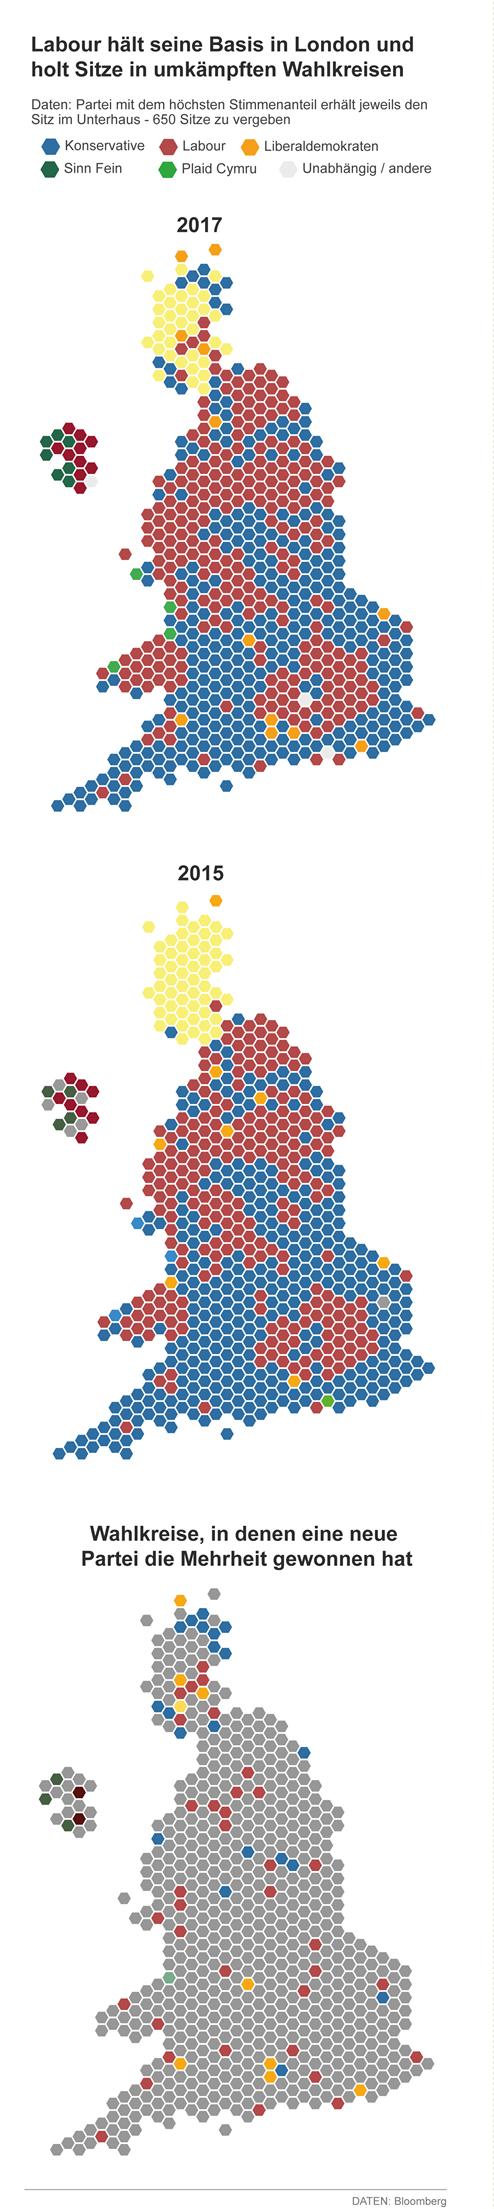 Ergebnis Wahl England